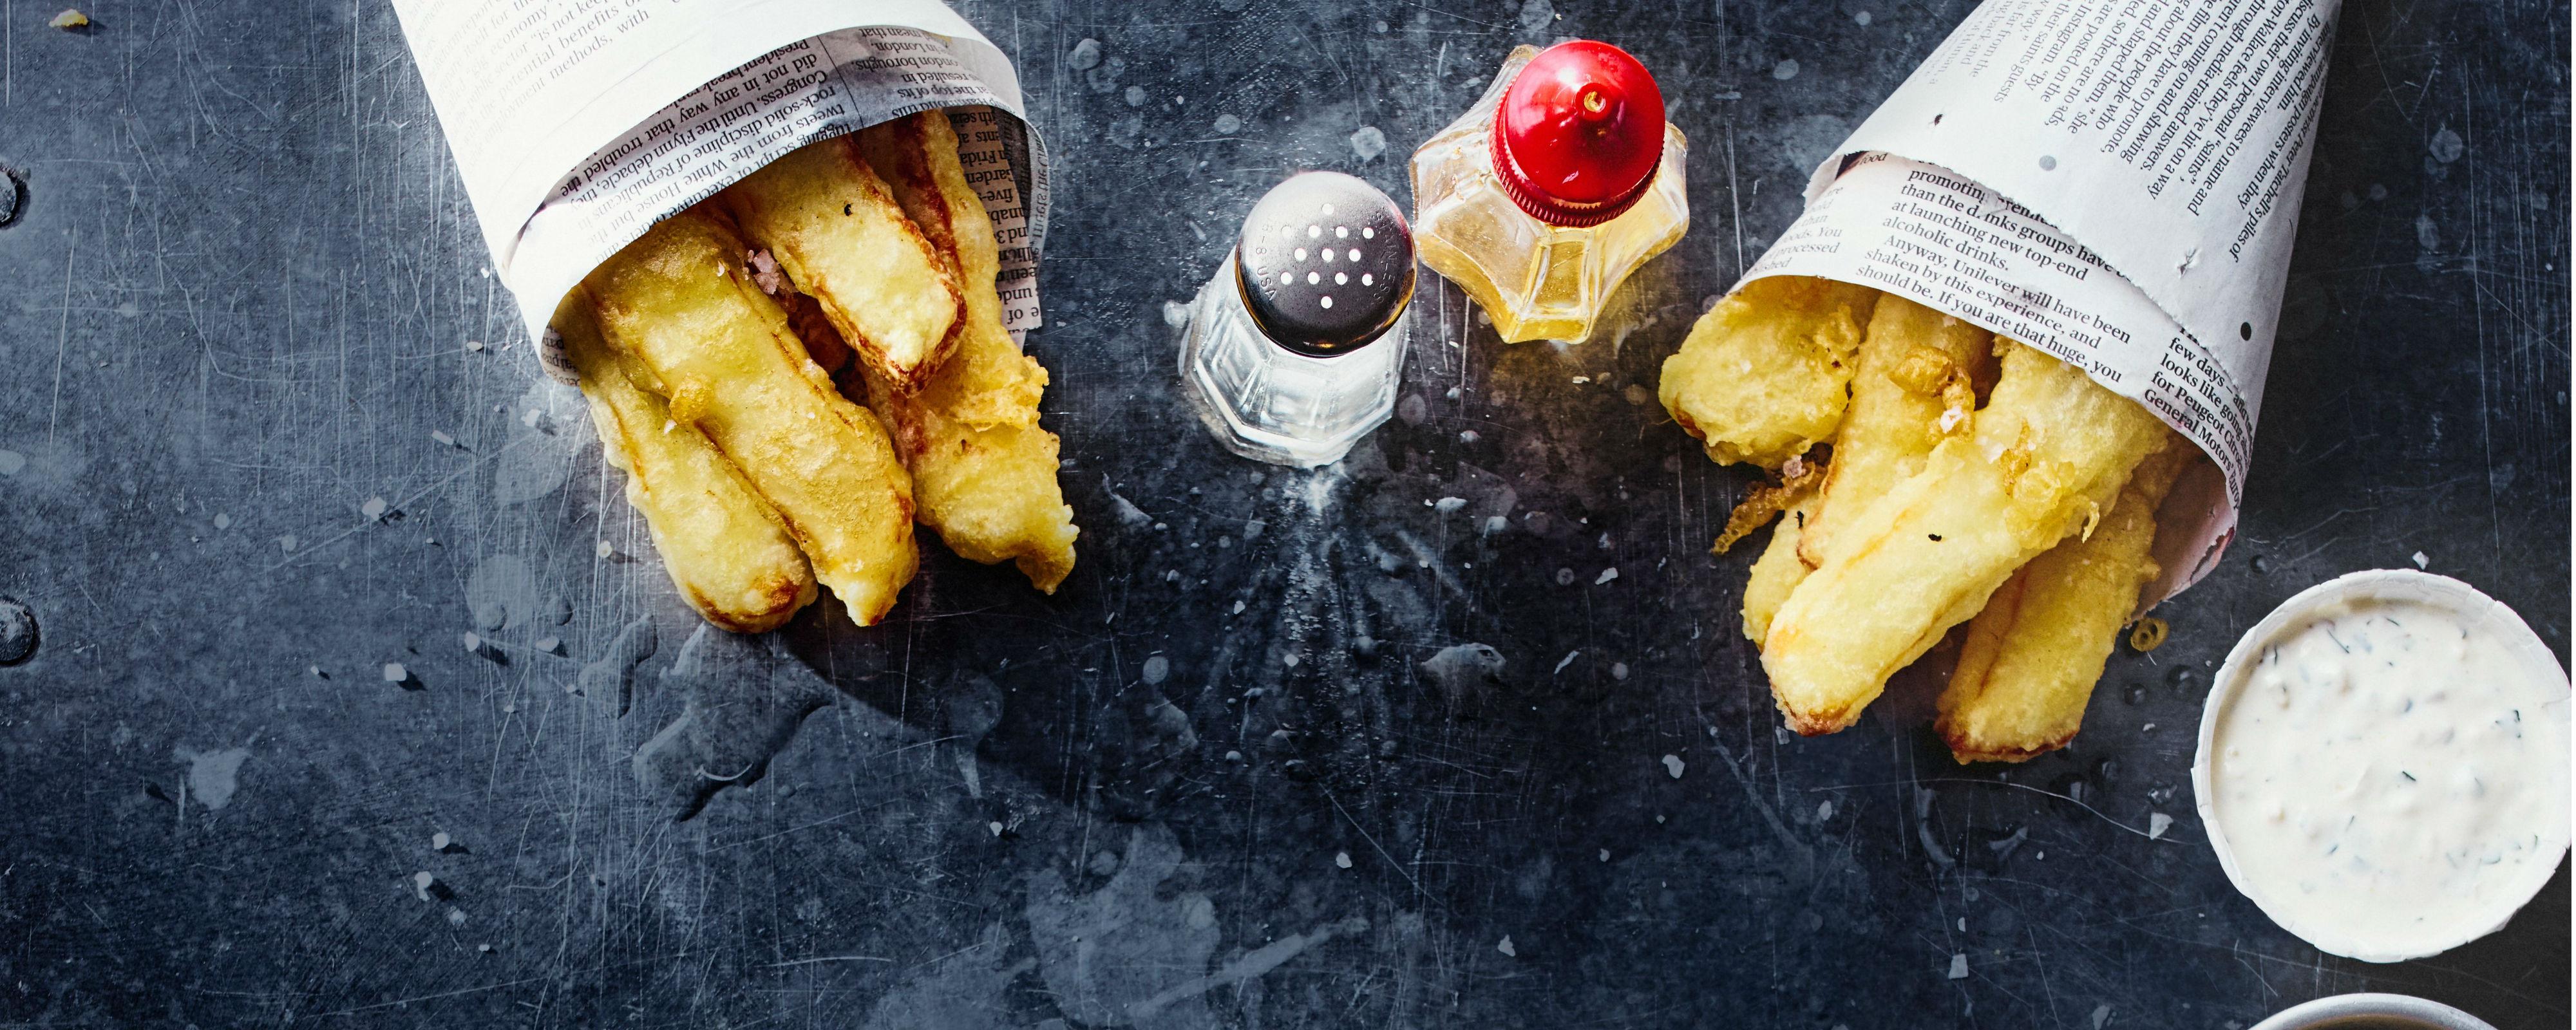 Halloumi fries with salt and vinegar